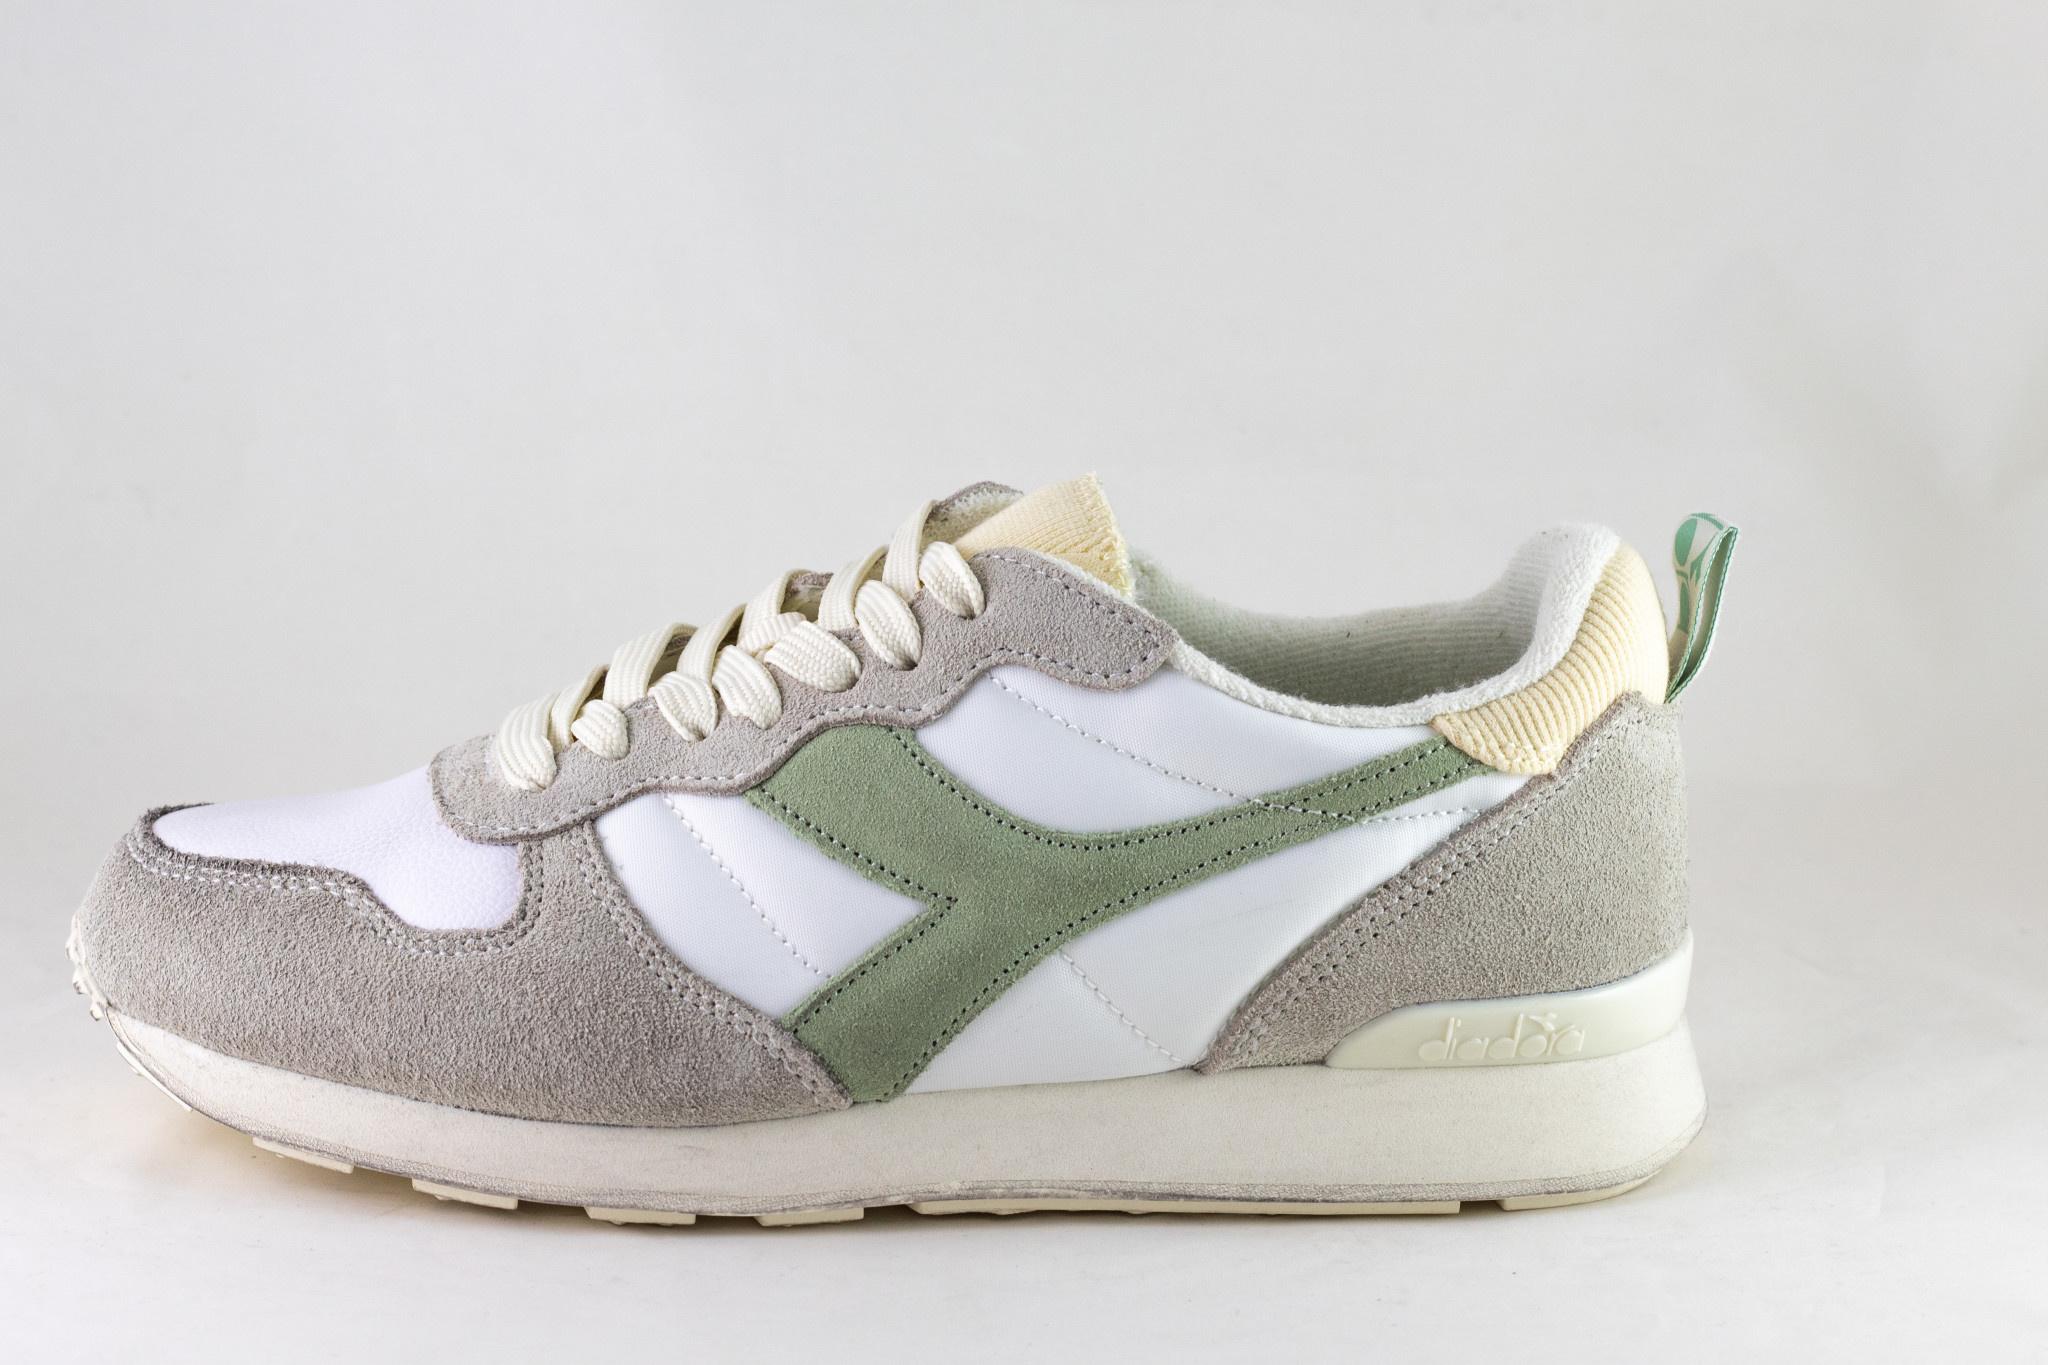 DIADORA CAMARO ICONA White/ Celadon Green